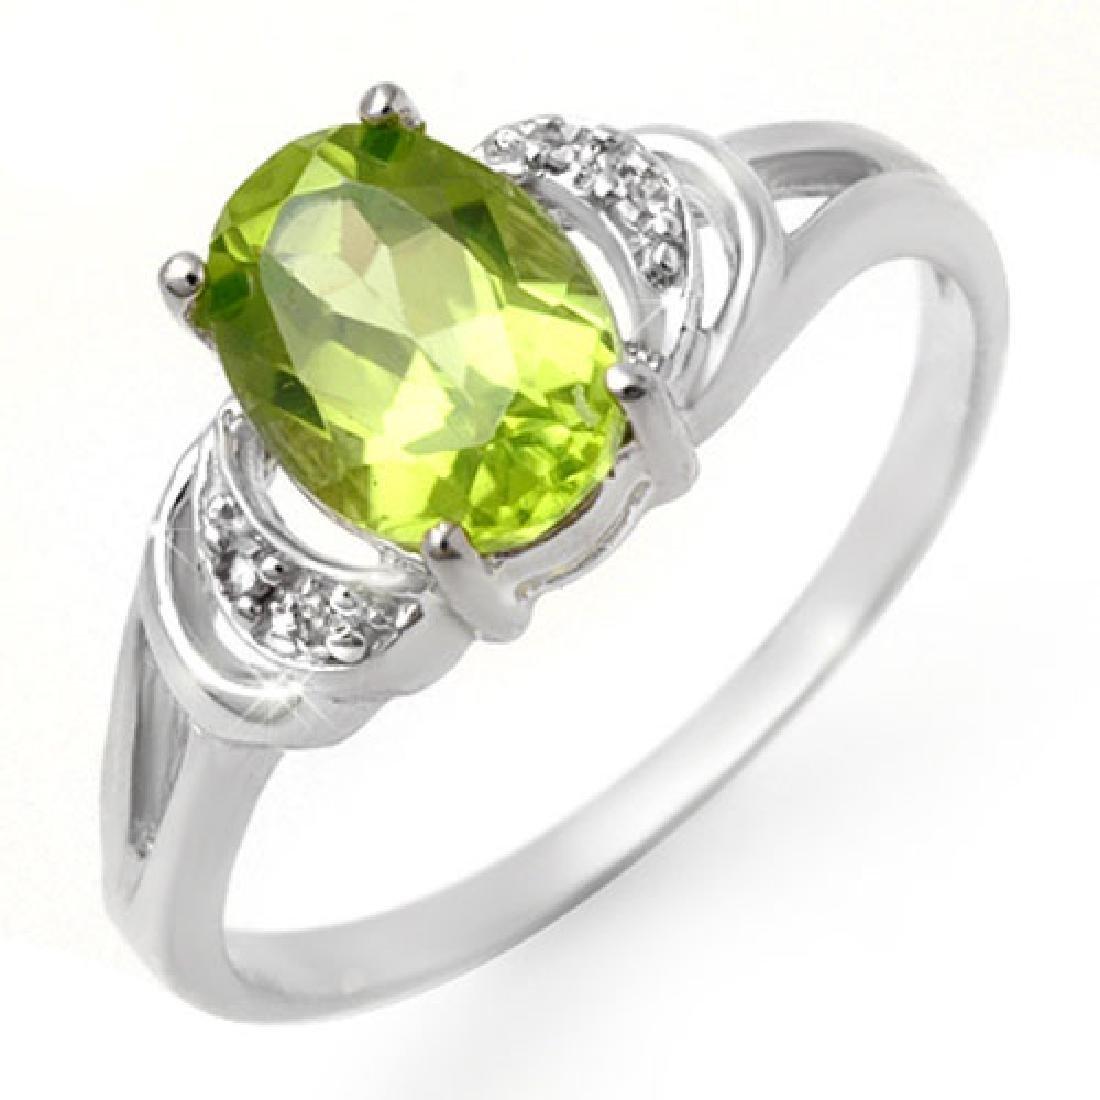 1.55 CTW Peridot & Diamond Ring 14K White Gold